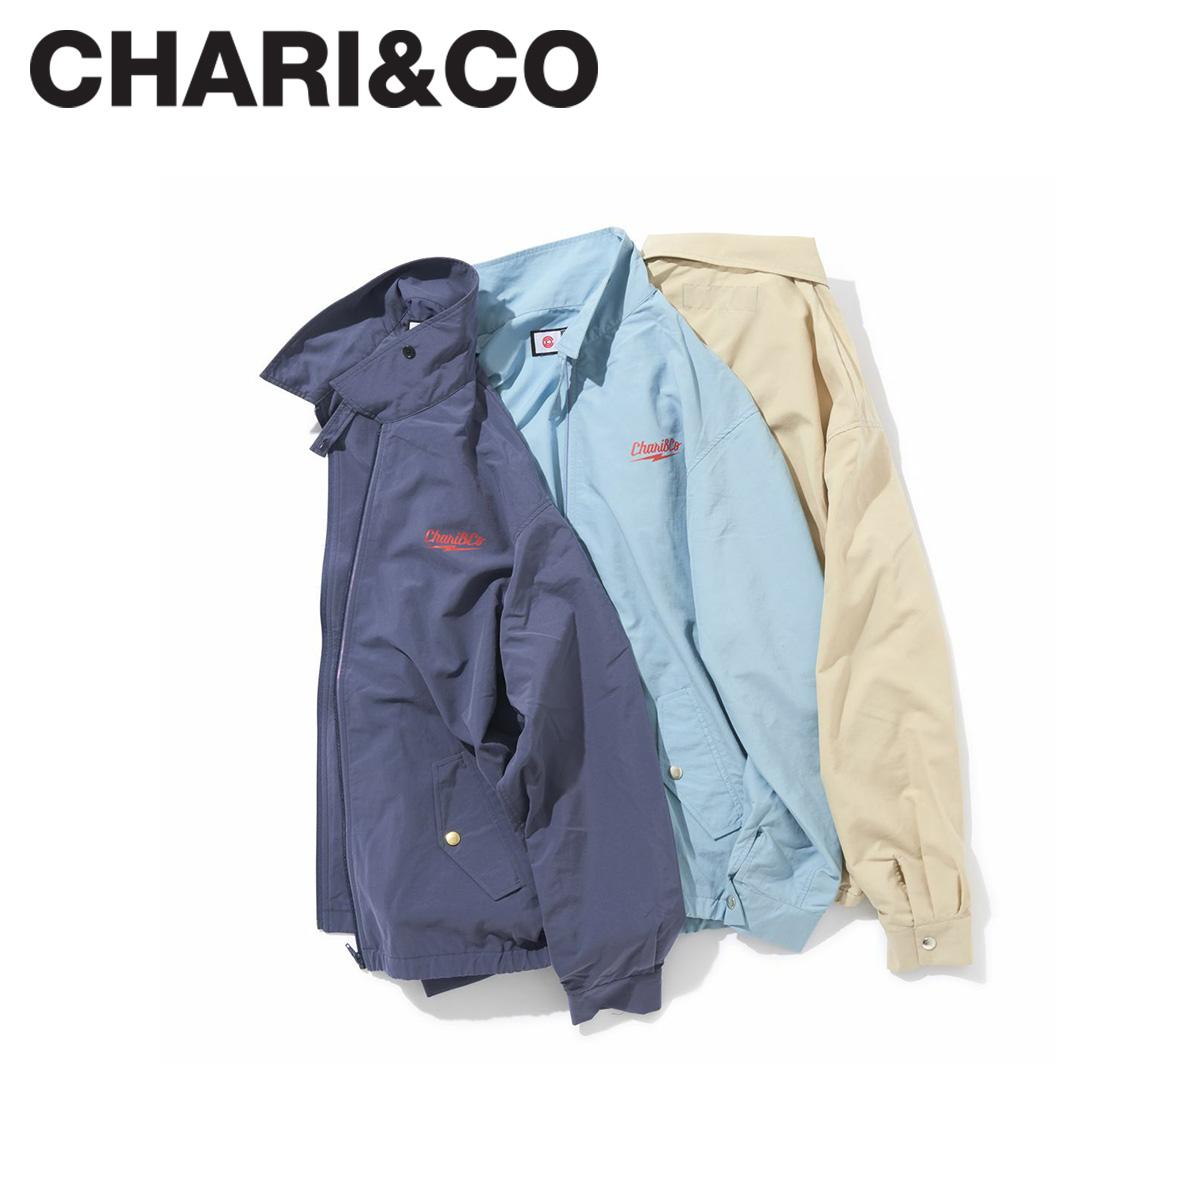 CHARI&CO チャリアンドコー ジャケット サンダーロゴジャケット メンズ レディース THUNDER LOGO JKT ネイビー ベージュ ブルー